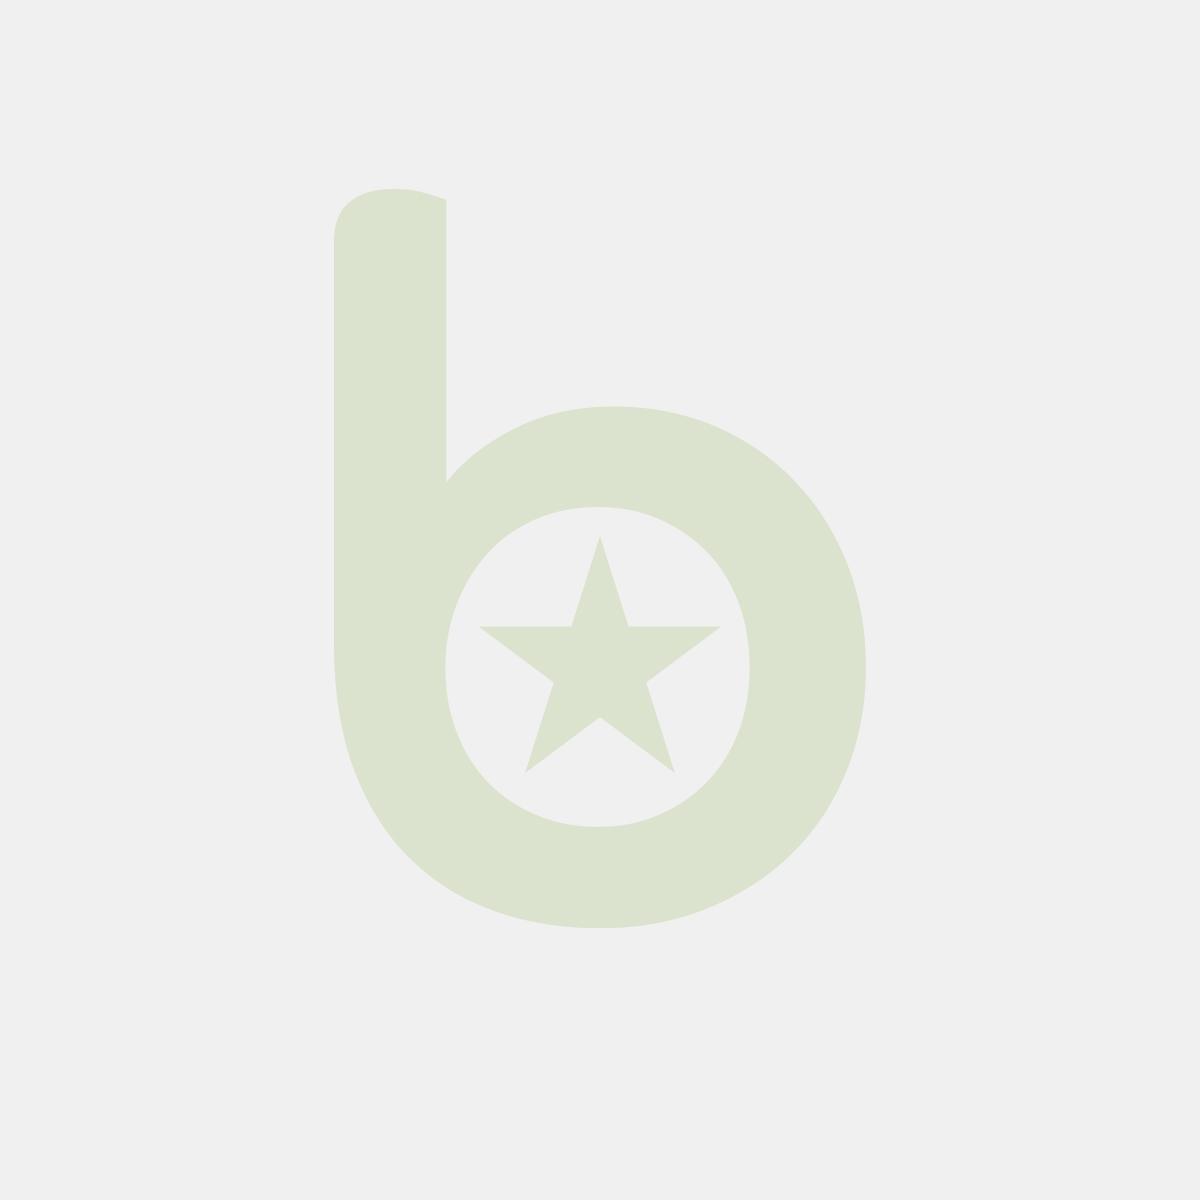 Uruchamianie klap dymowych BB - 148 x 100mm BB002BBPN